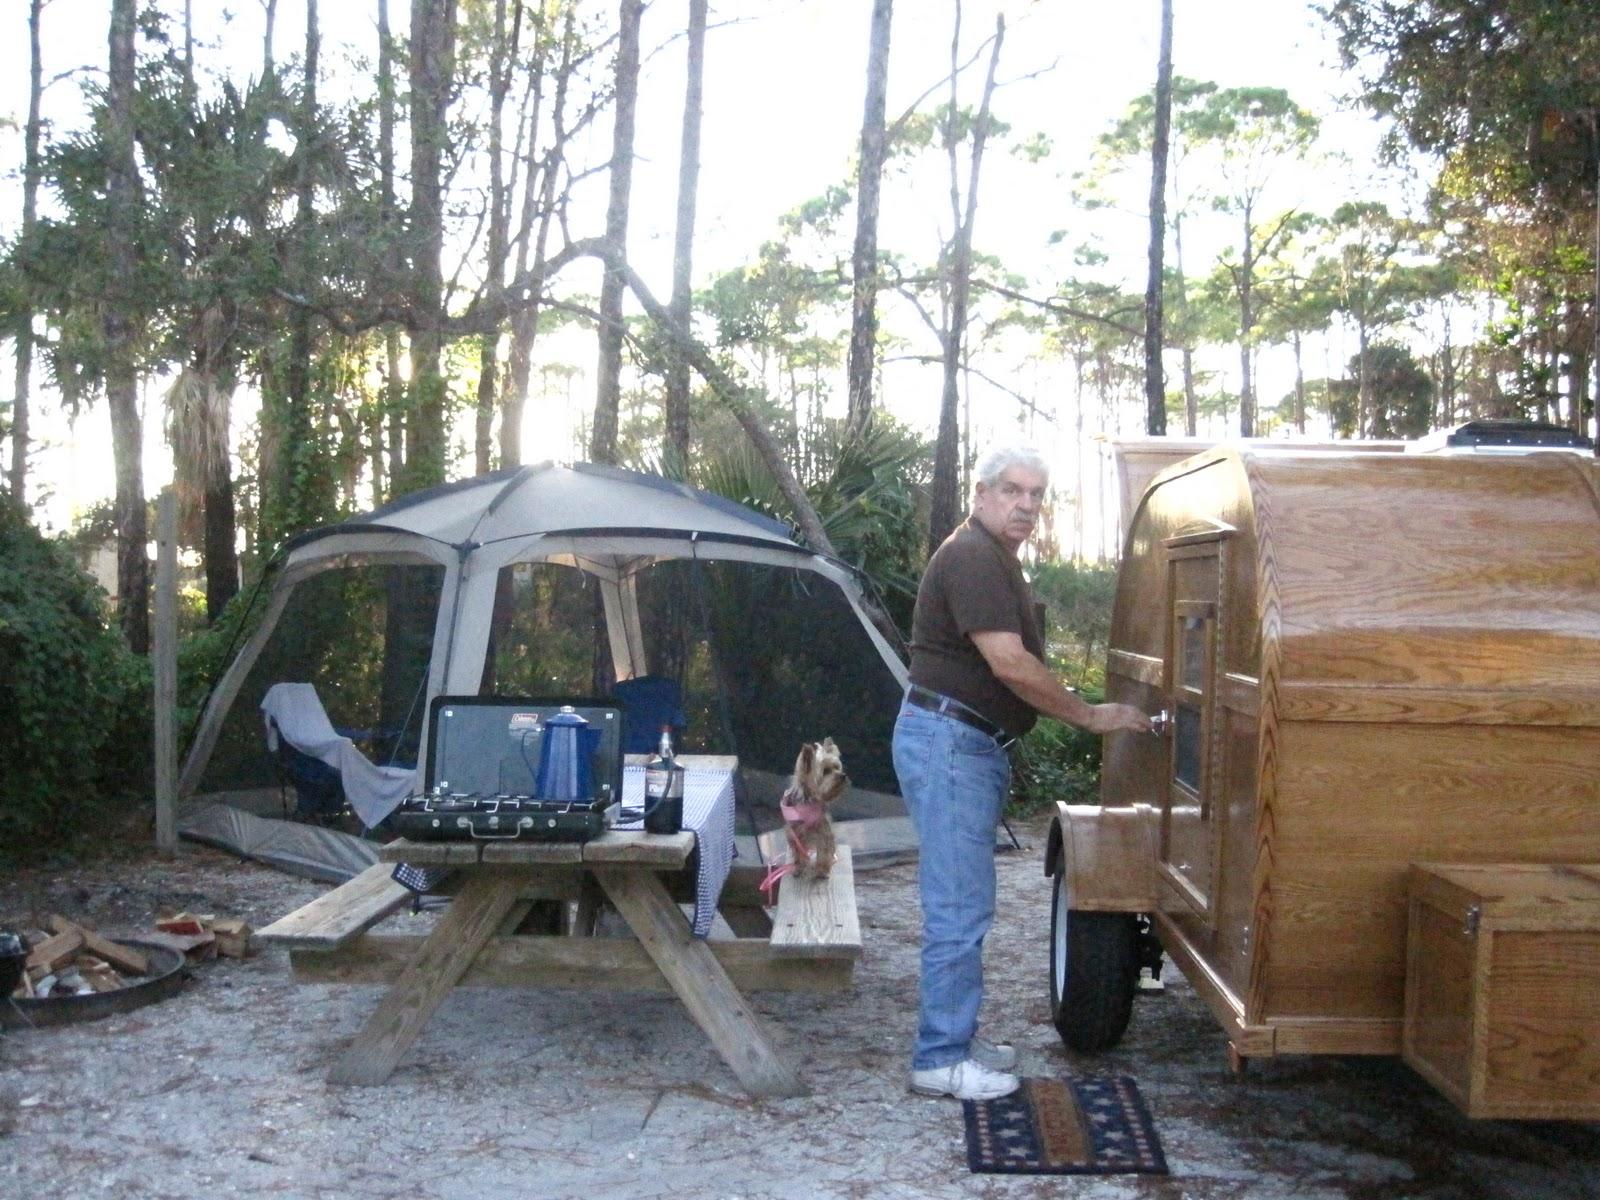 TH Stone Memorial St. Joseph Peninsula State Park (FL)